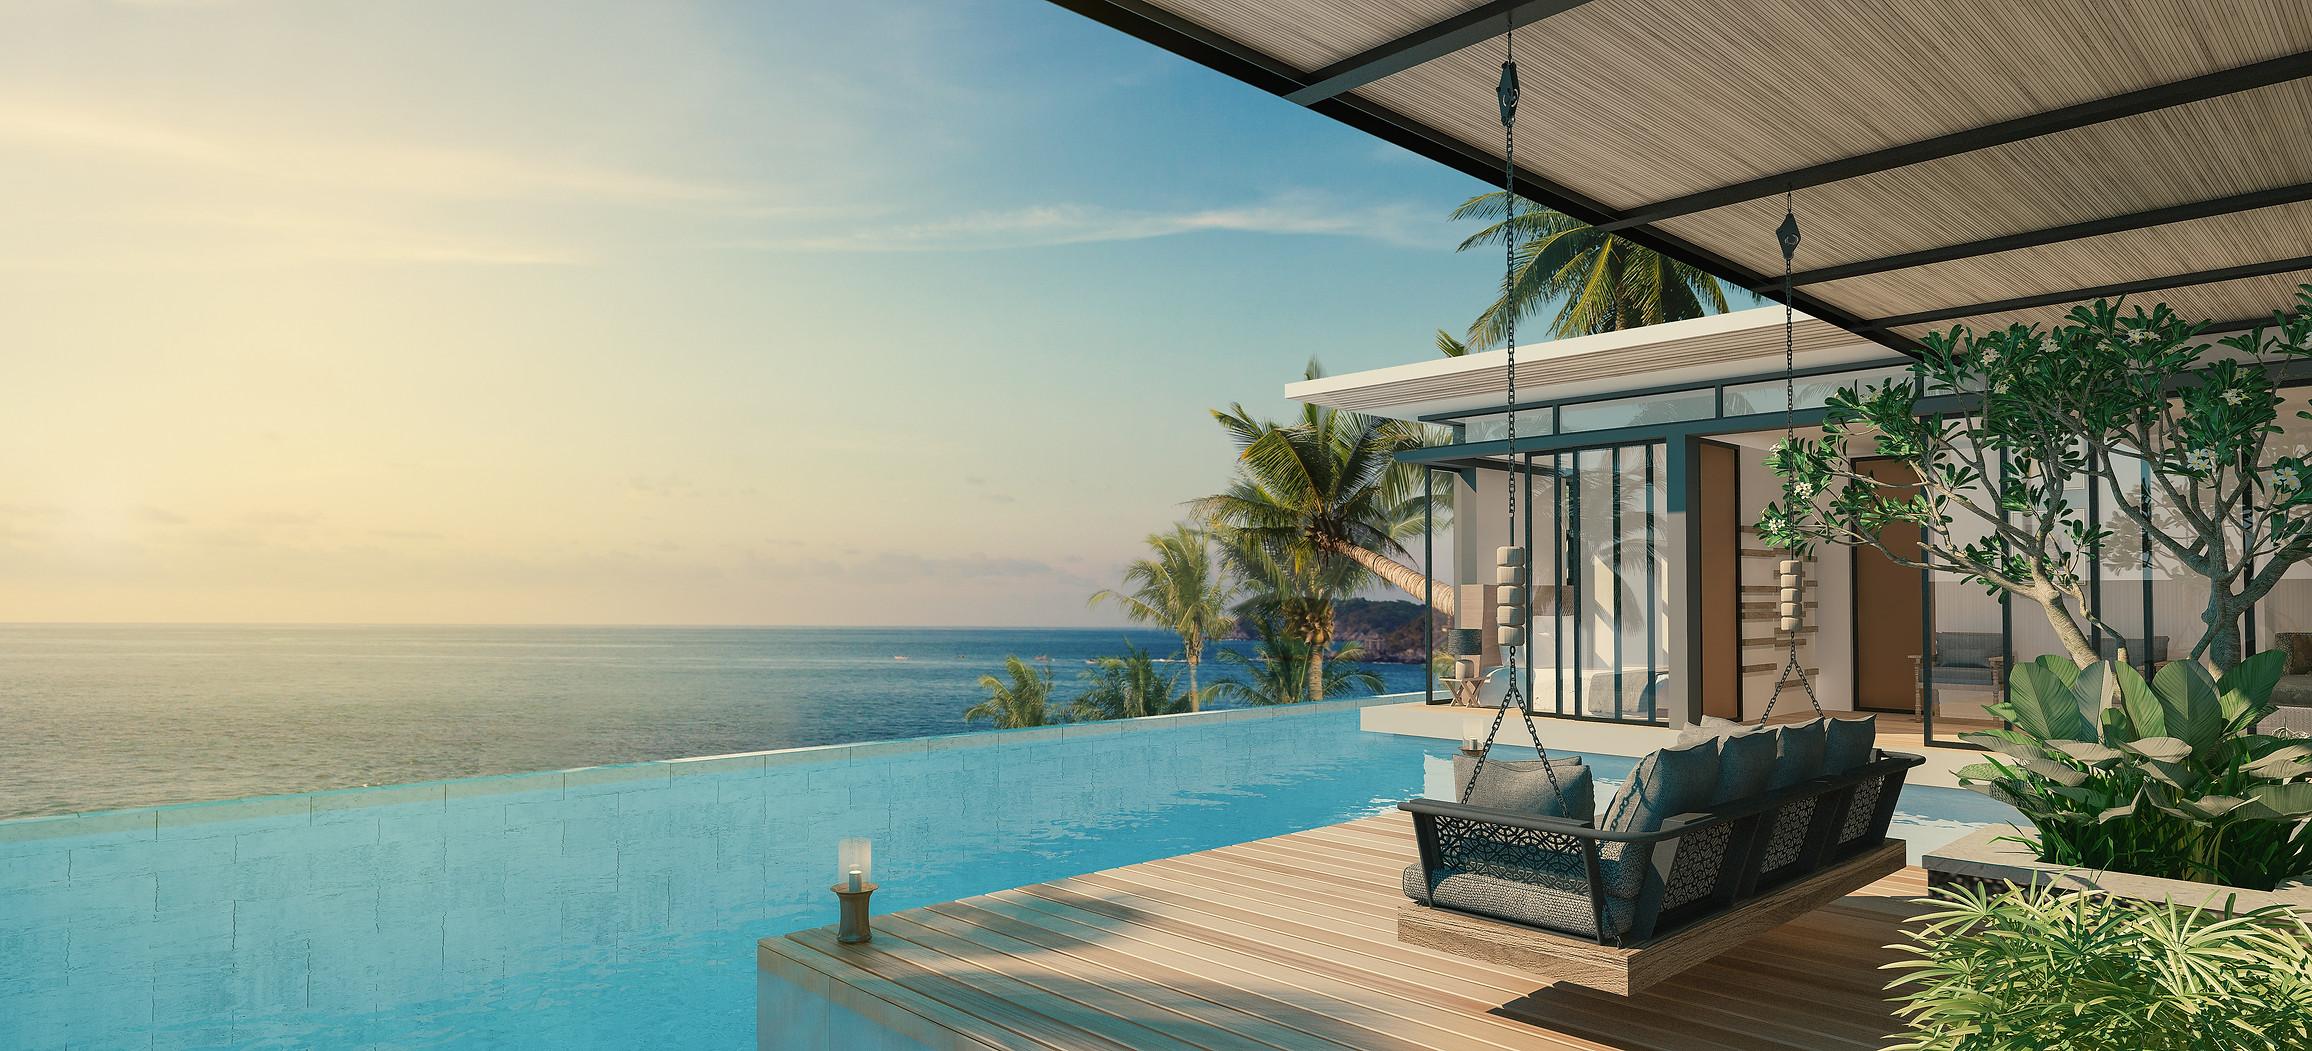 Luxury Noosa Sunshine Coast Queensland Real Estate Buyer's Agent